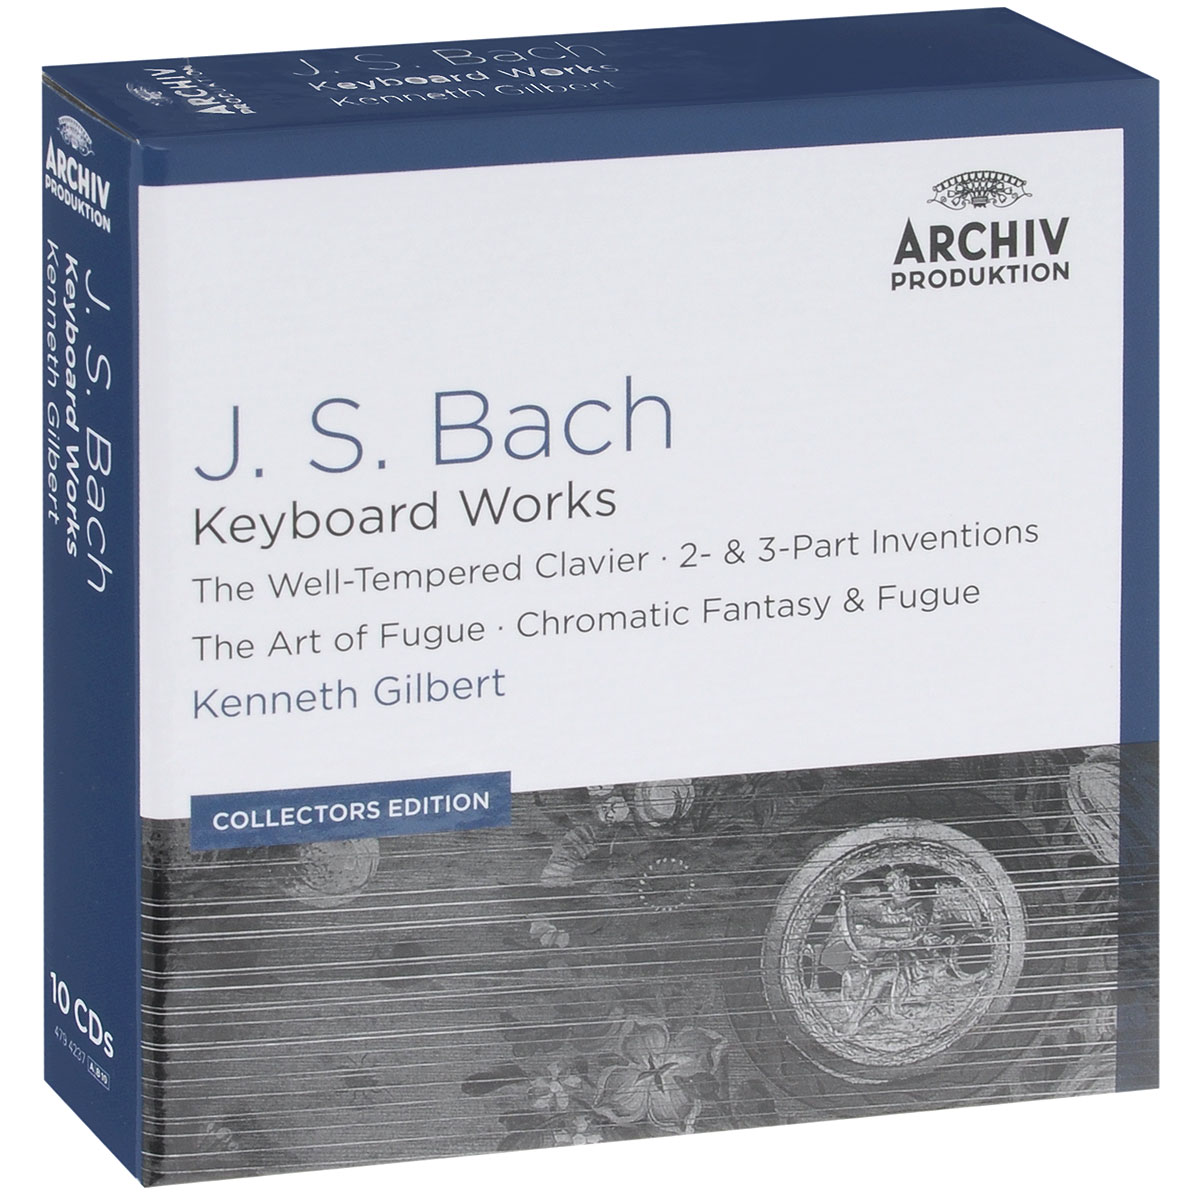 Кеннет Гилберт,Тревор Пиннок,Ларс Мортенсен,Николас Крэмер J.S. Bach. Keyboard Works. Kenneth Gilbert. Collectors Edition (10 CD) staccato st029ebptj51